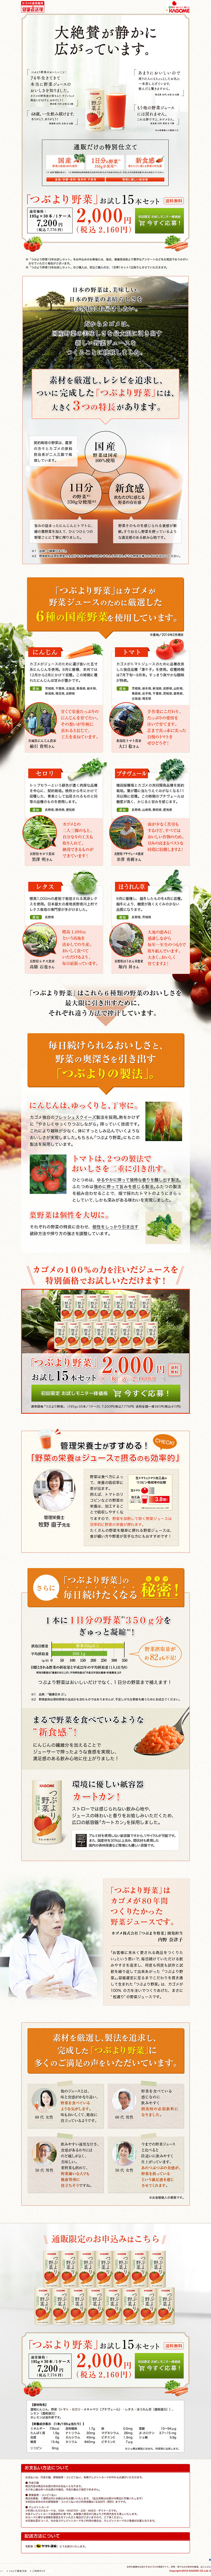 45-shop-kagome-co-jp-lp-tsubuyori_lpc-1465656988676